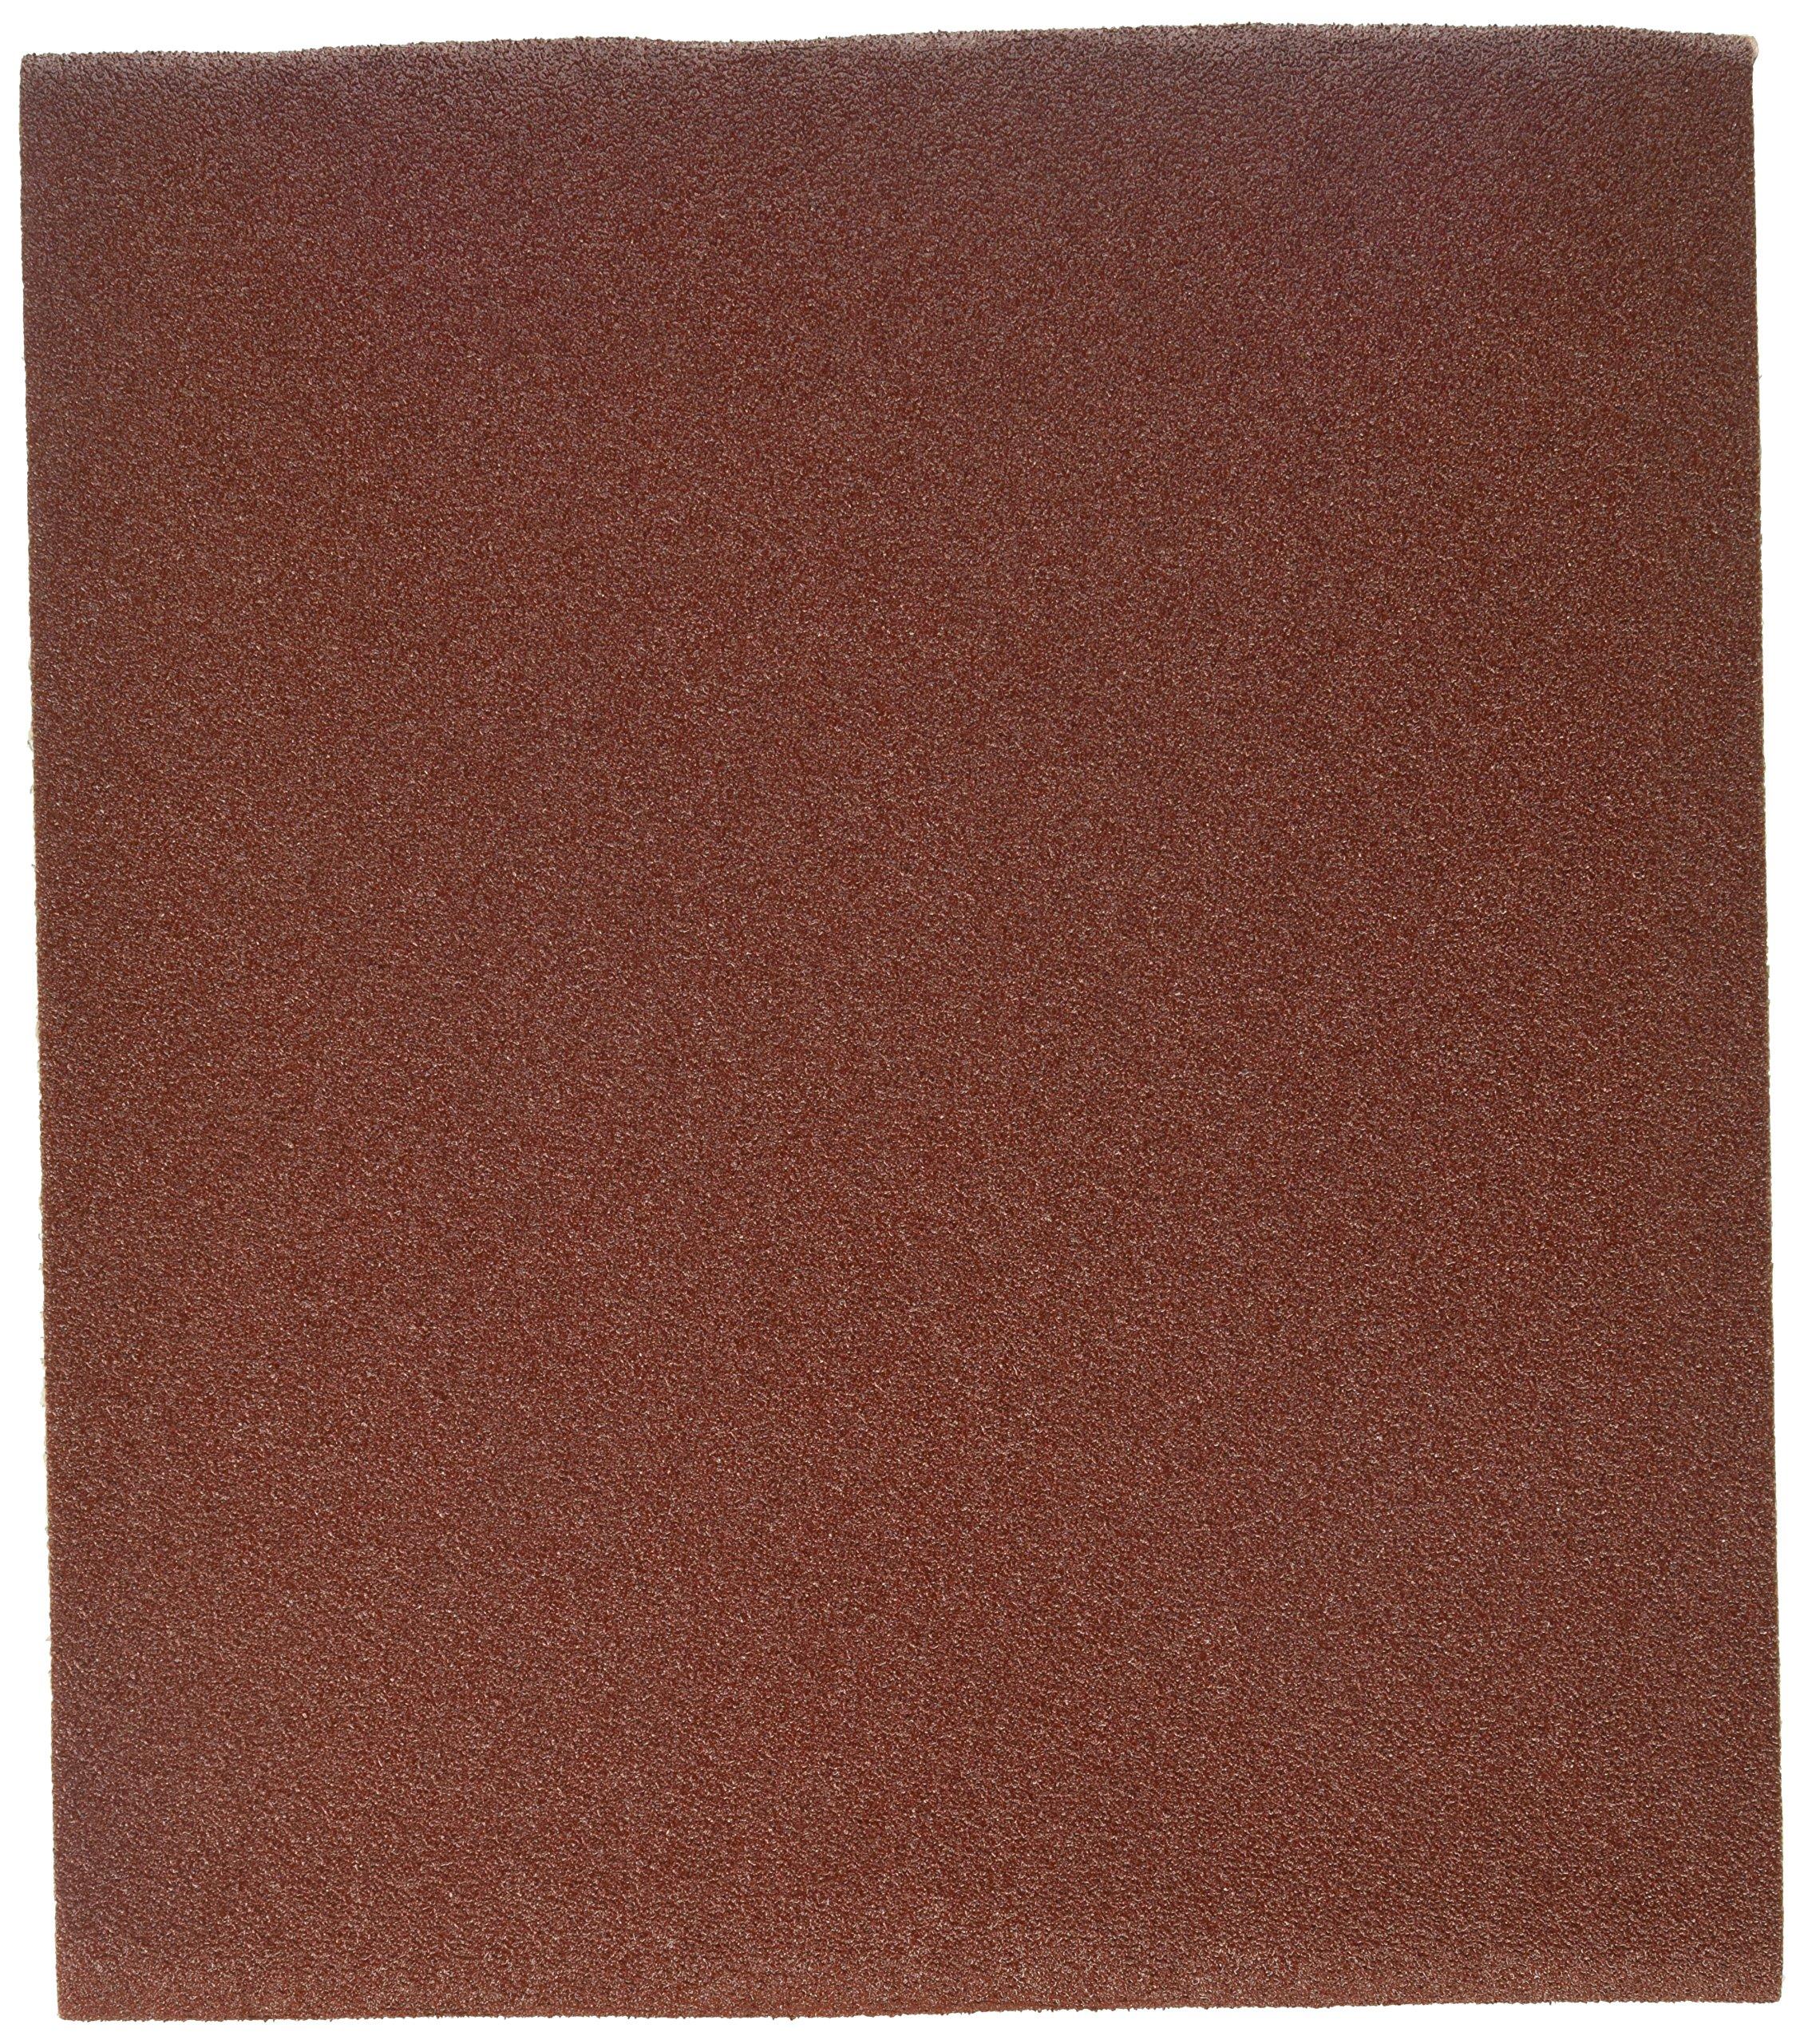 VIRGINIA ABRASIVES 018-81960 8x19 60G Cloth Belt